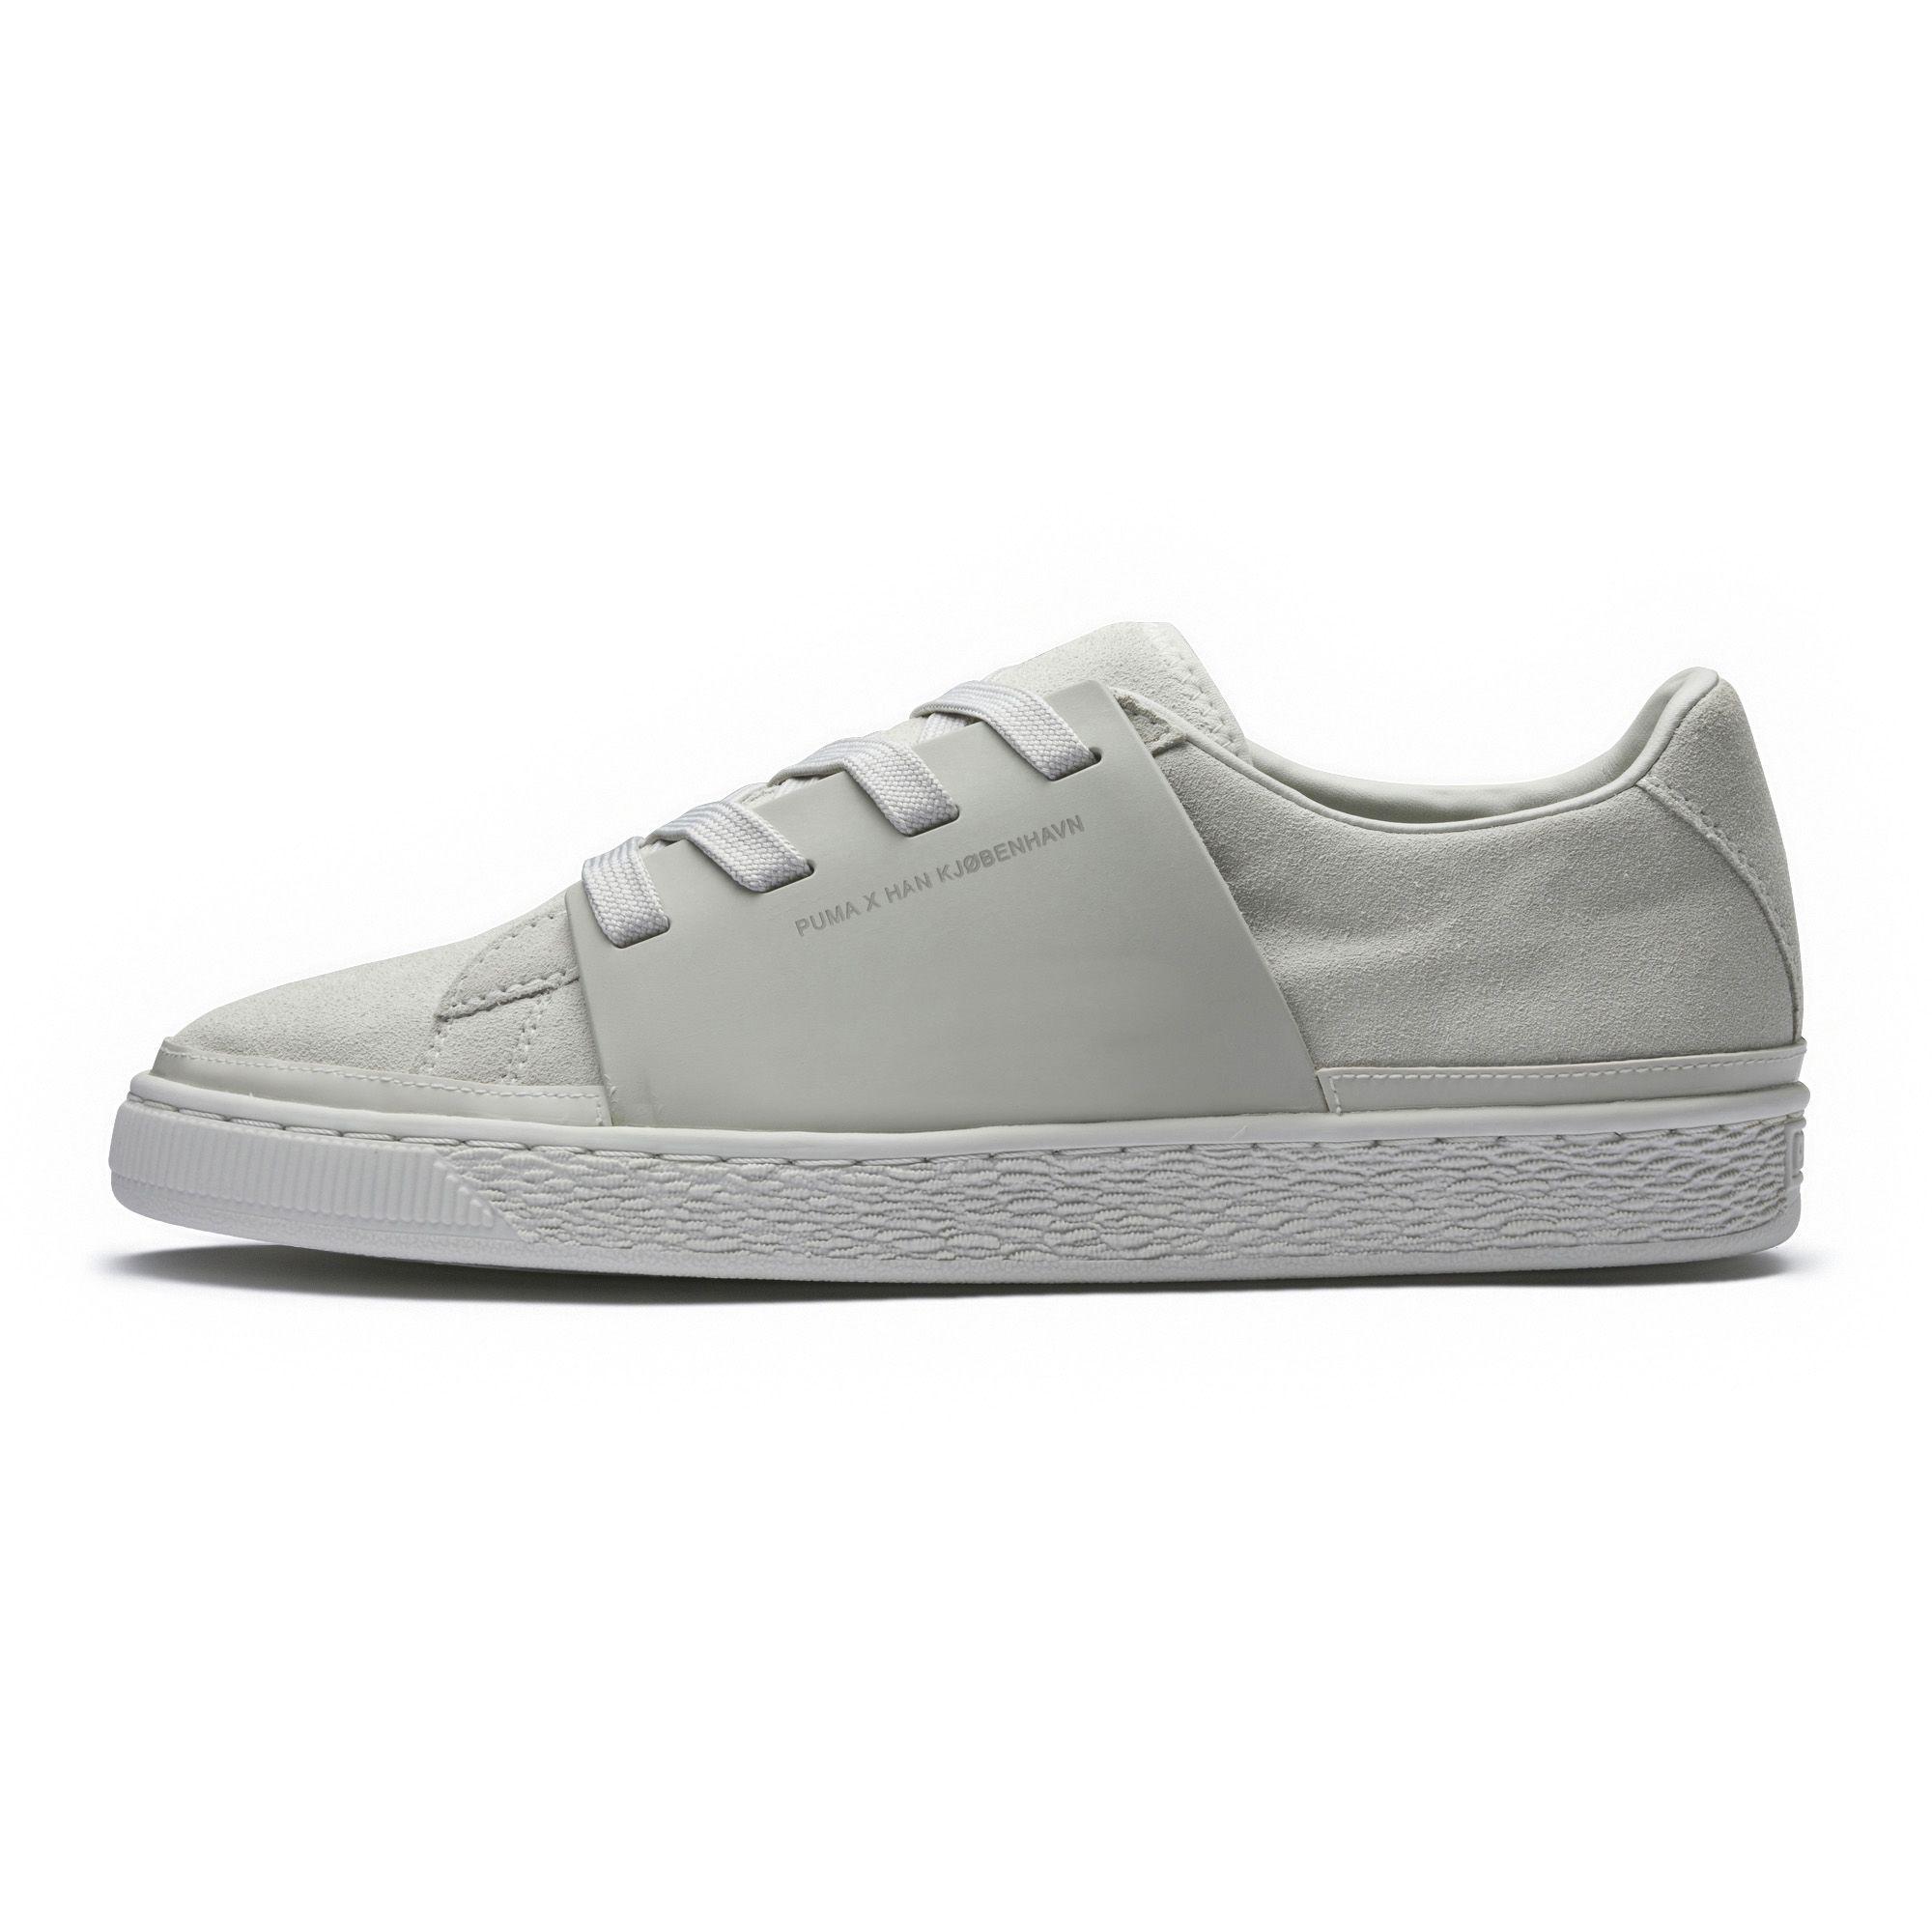 7222bdb4b96 Lyst - PUMA X Han Kjøbenhavn Suede Sneakers for Men